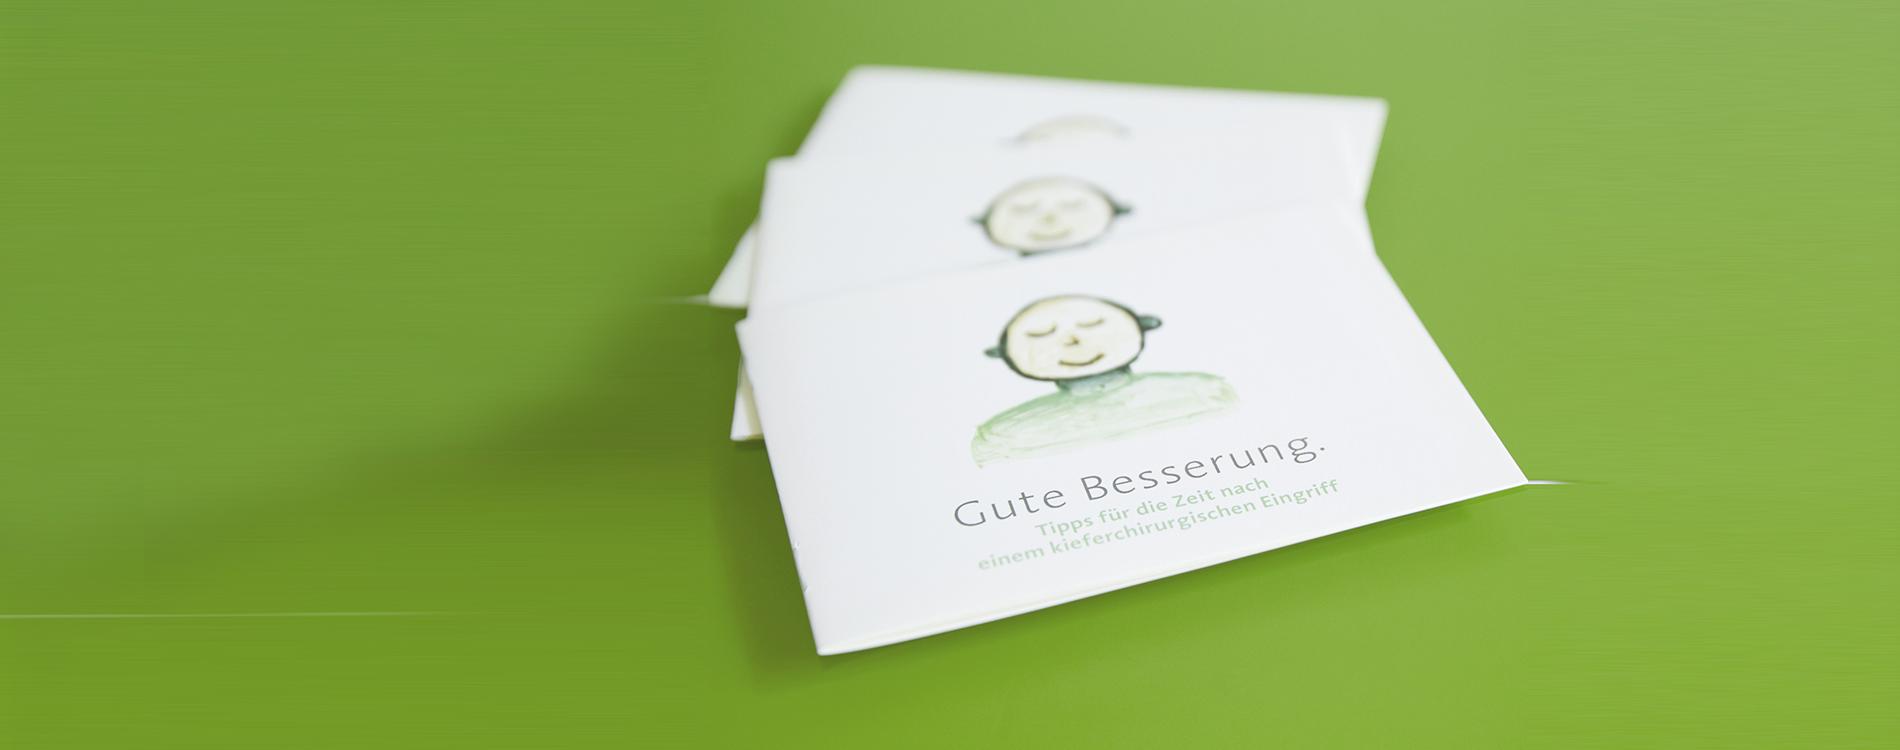 Keramikimplantat-Hamburg-Knochenaufbau-Oralchirurgie-gross